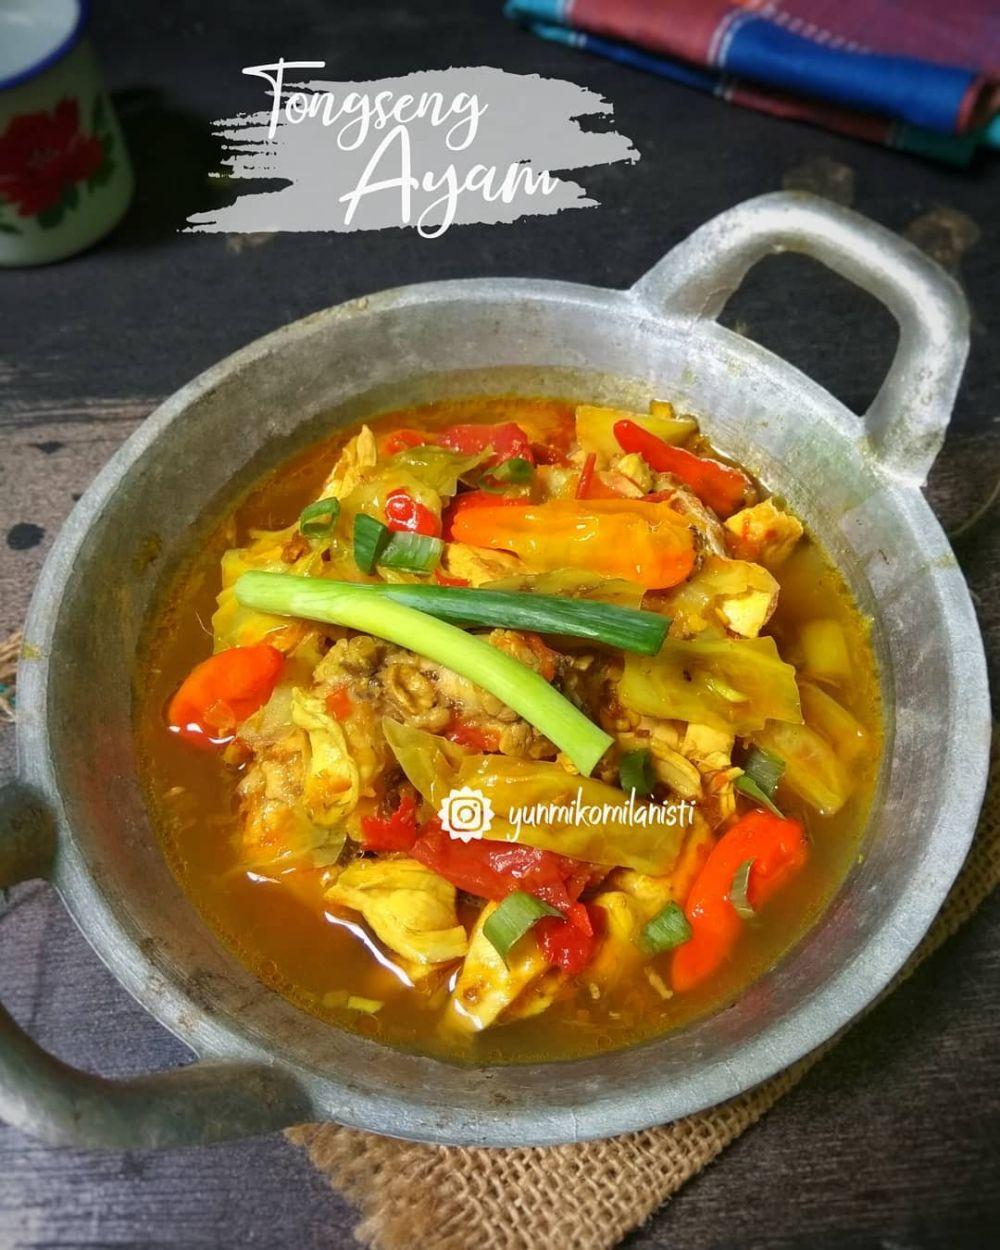 13 Resep makanan berkuah Instagram/@guniezzt  @dapurpenuhcinta